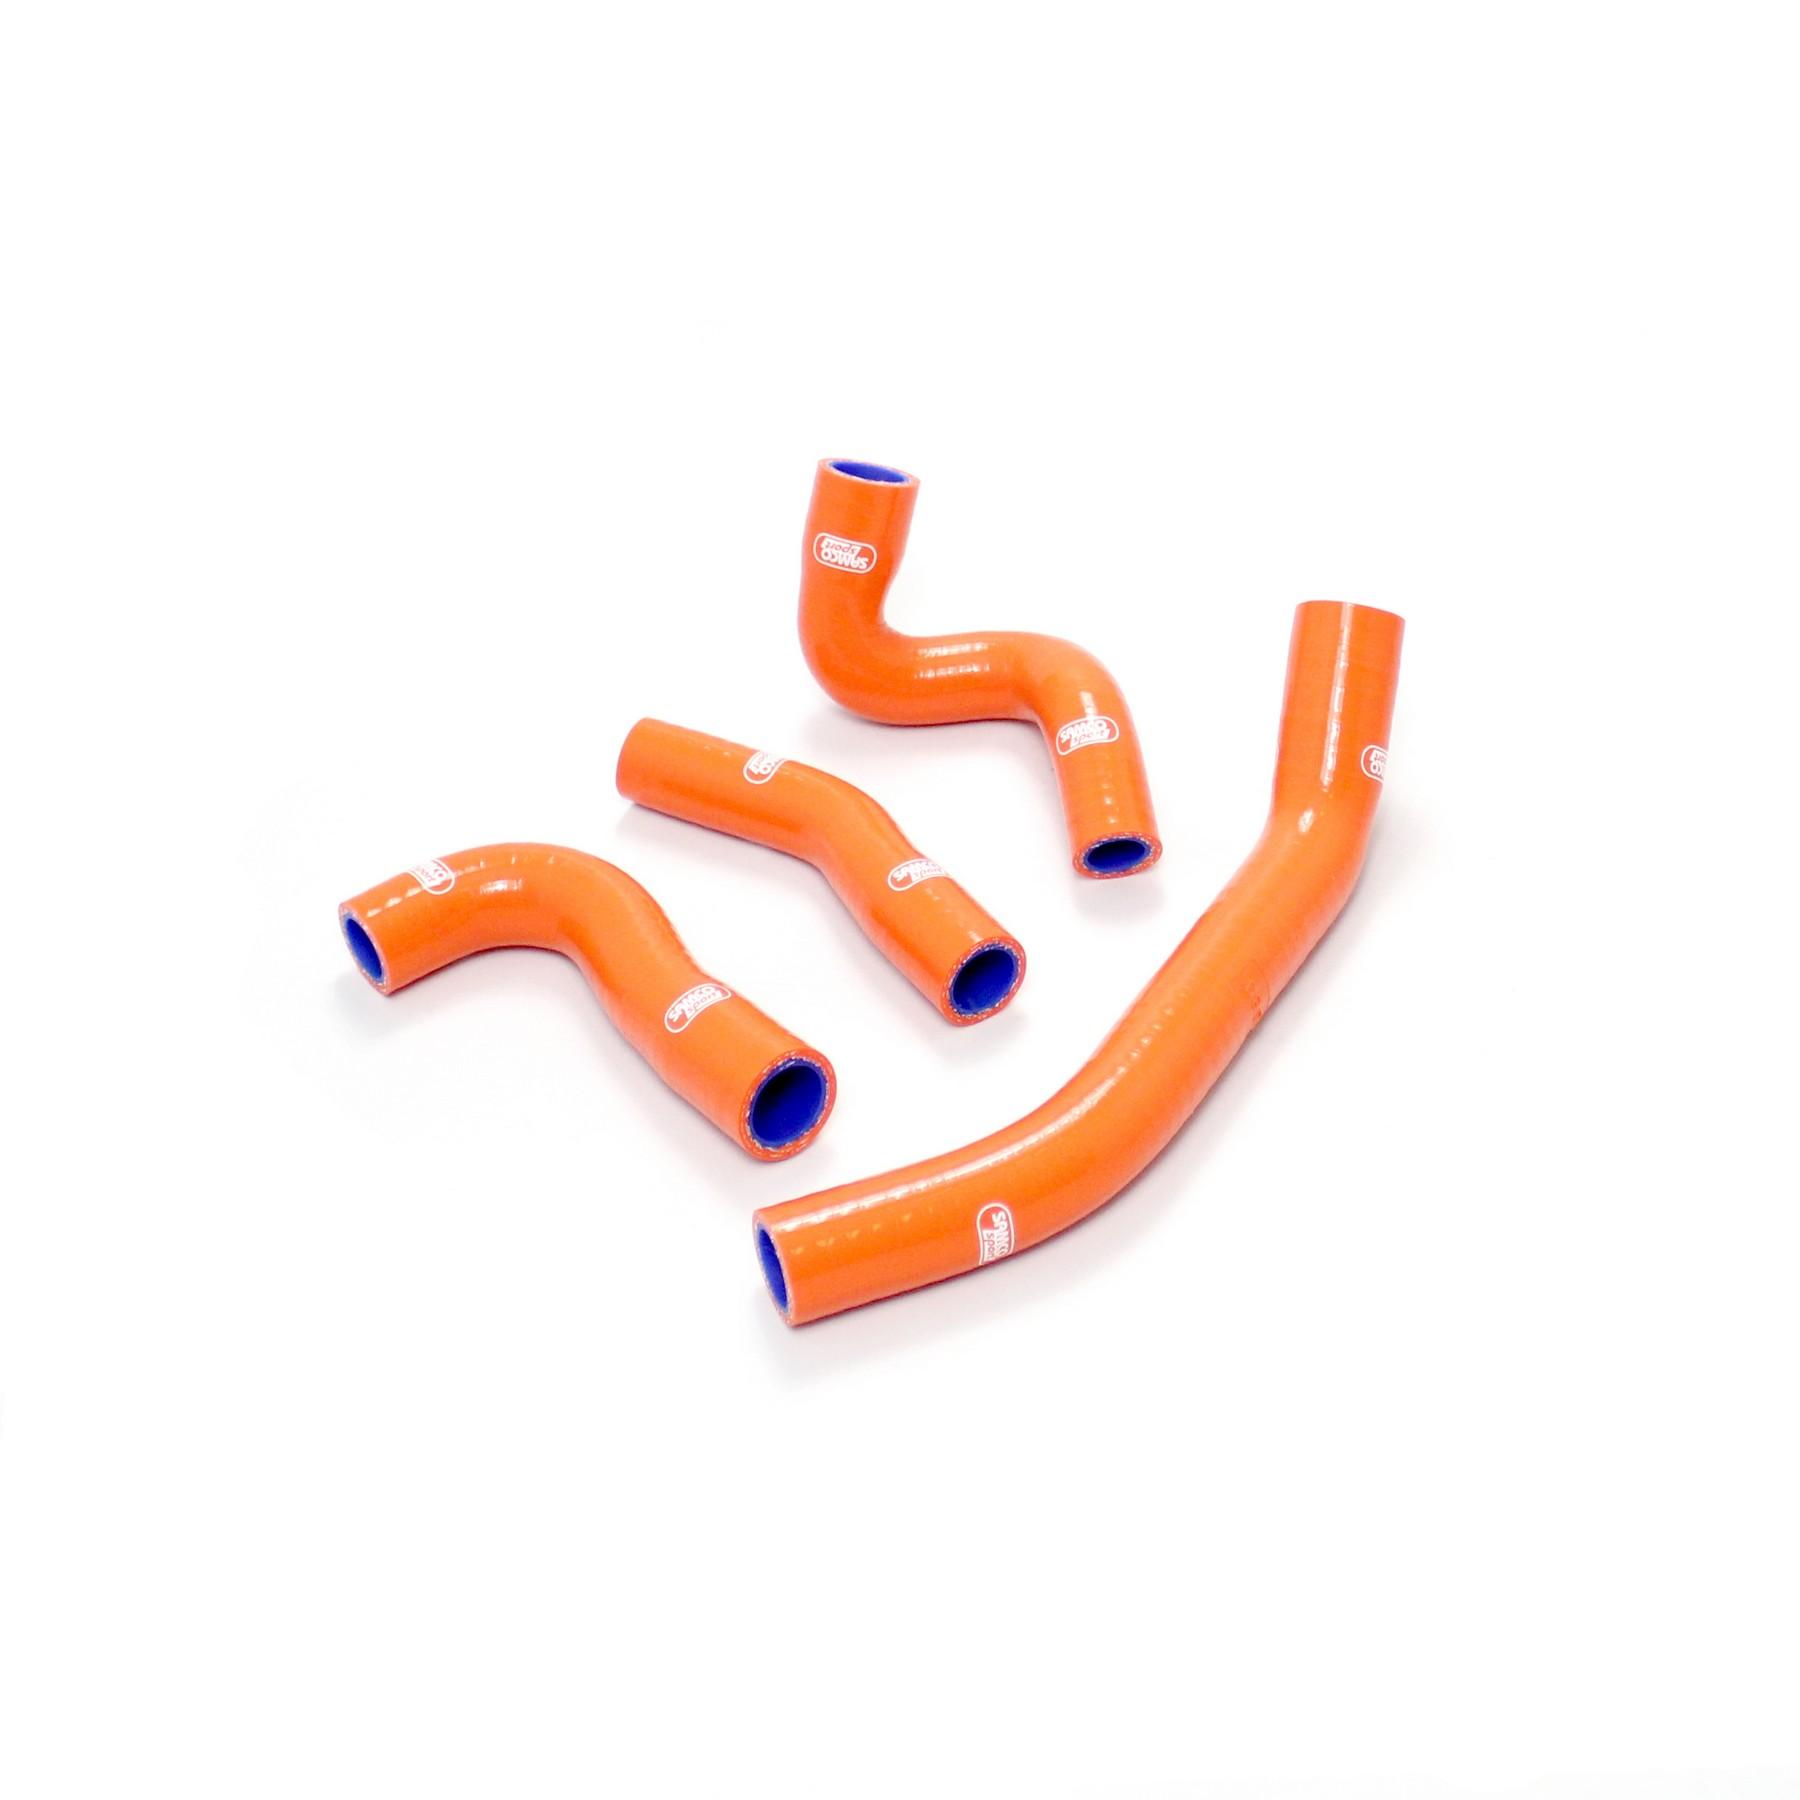 【SAMCOSPORT】KTM-62 冷卻液軟管 (水箱水管) - 「Webike-摩托百貨」